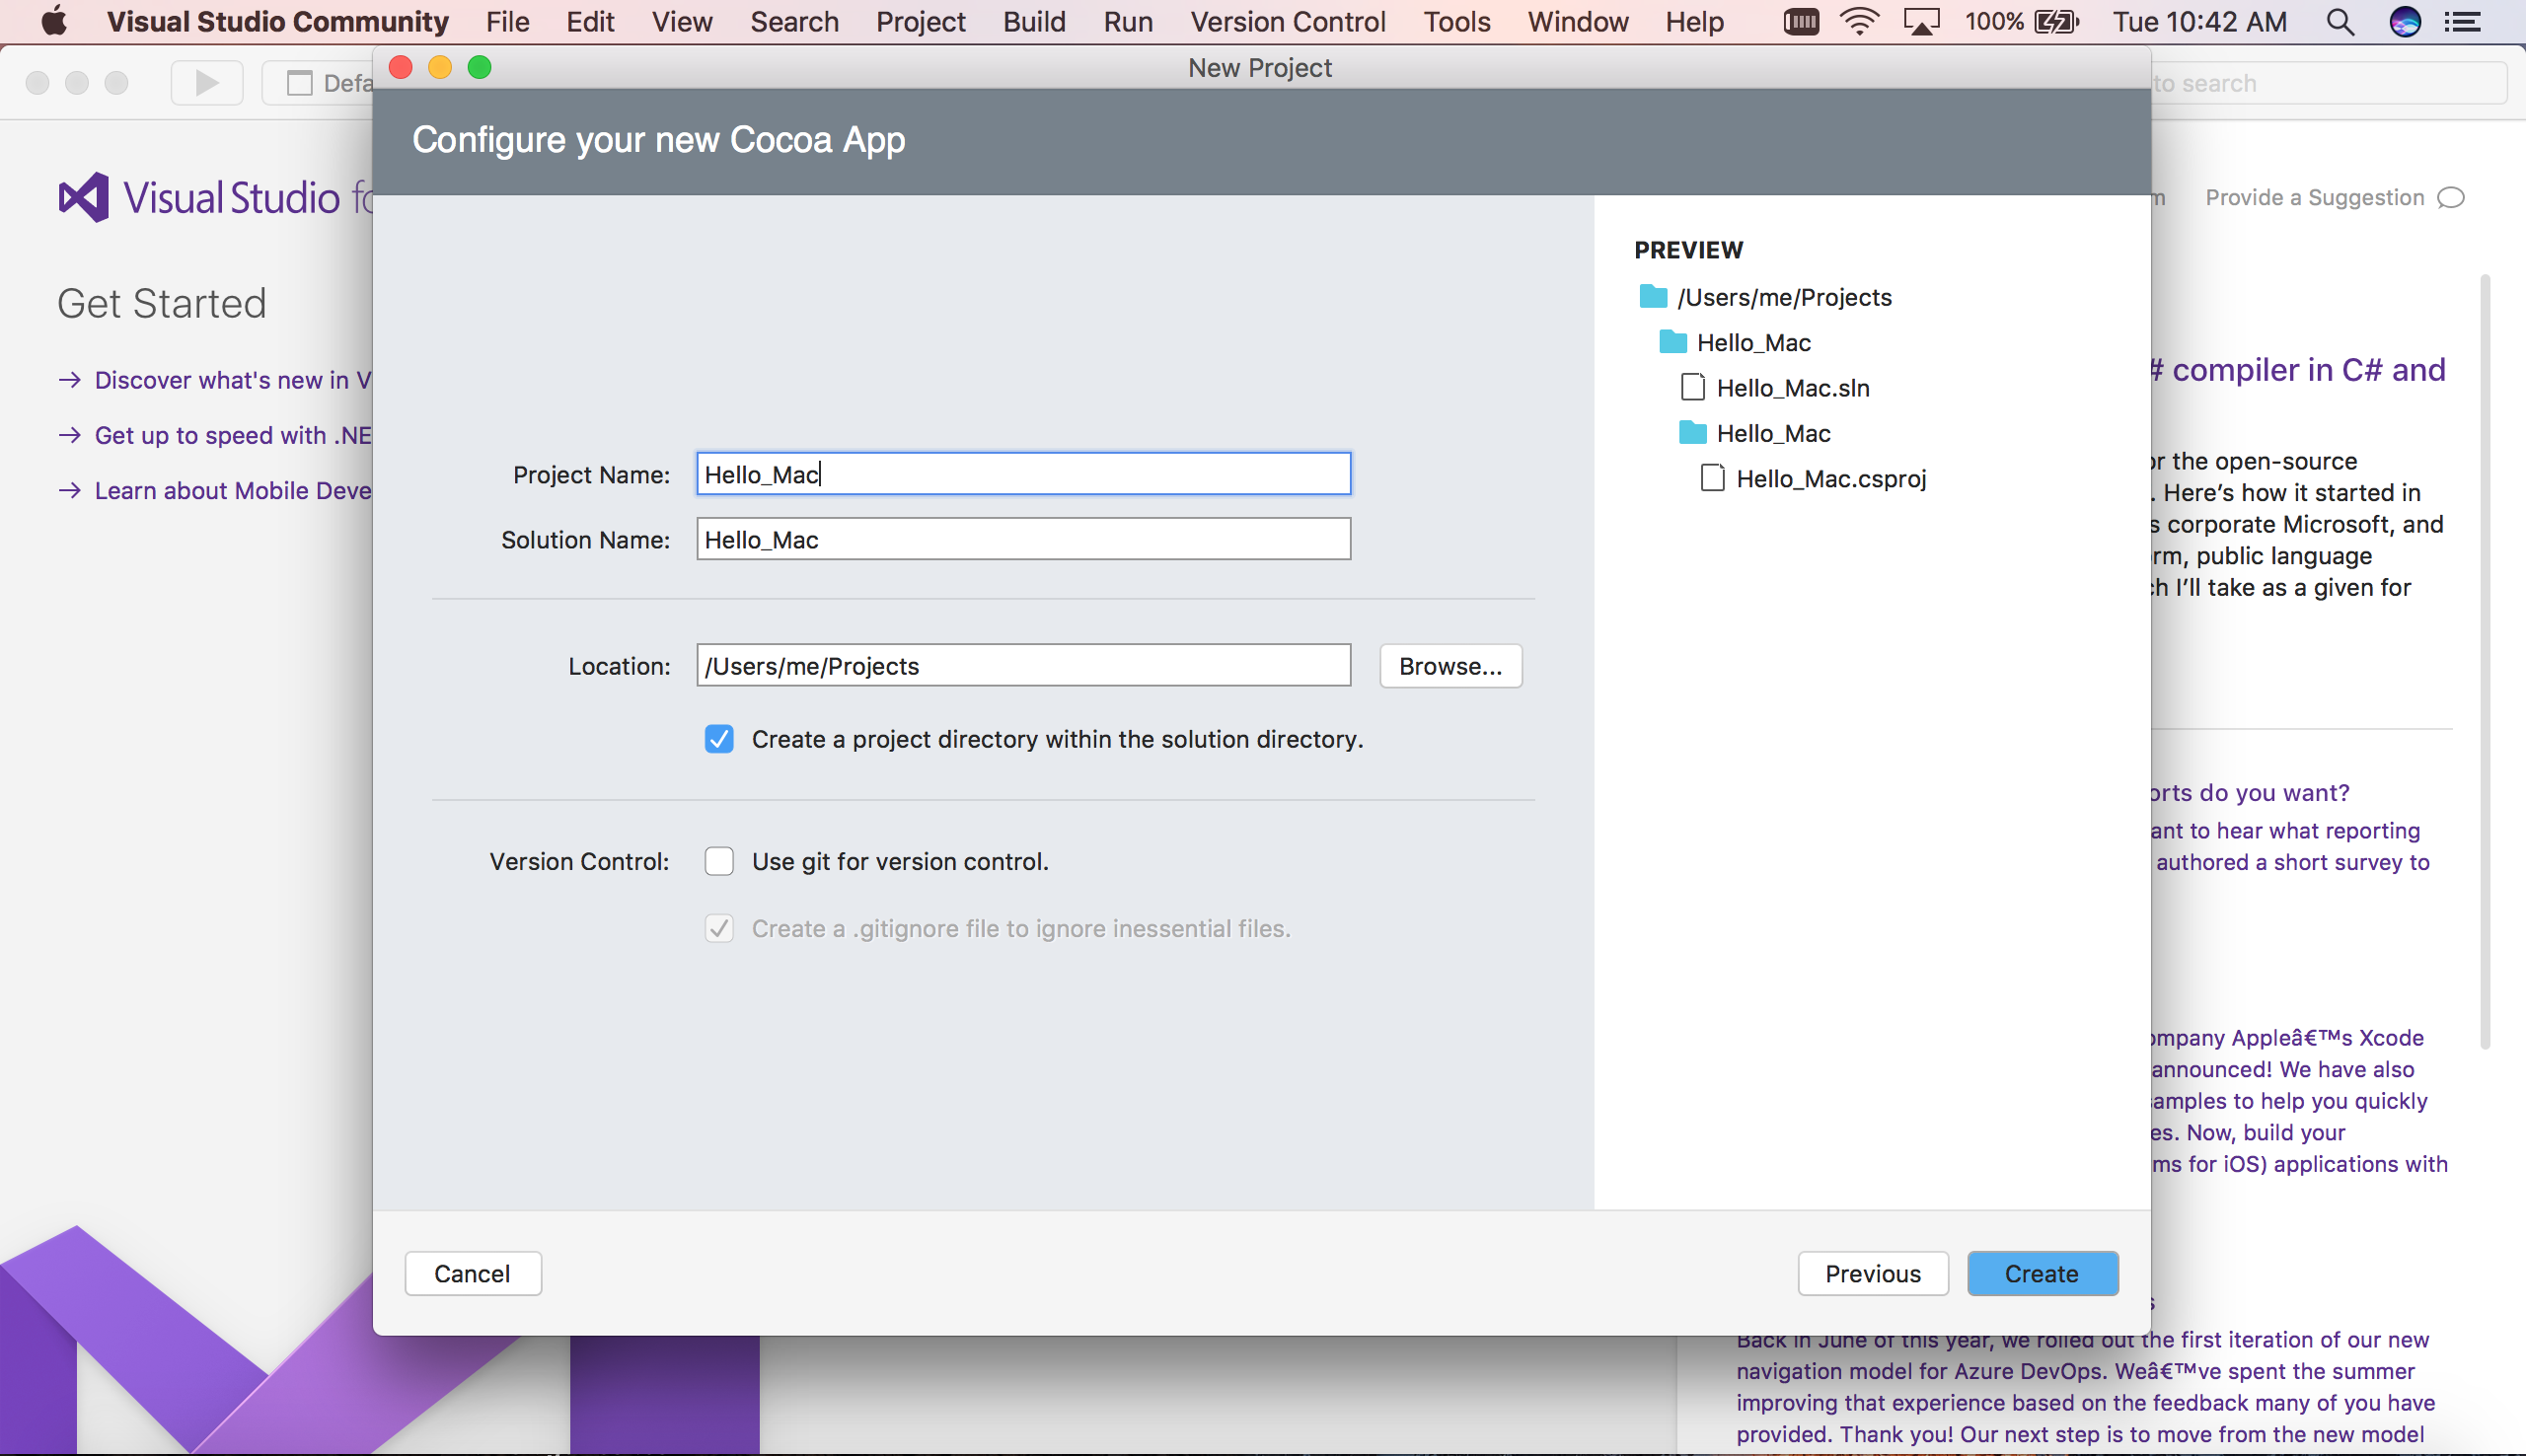 Hello, Mac – Walkthrough - Xamarin | Microsoft Docs